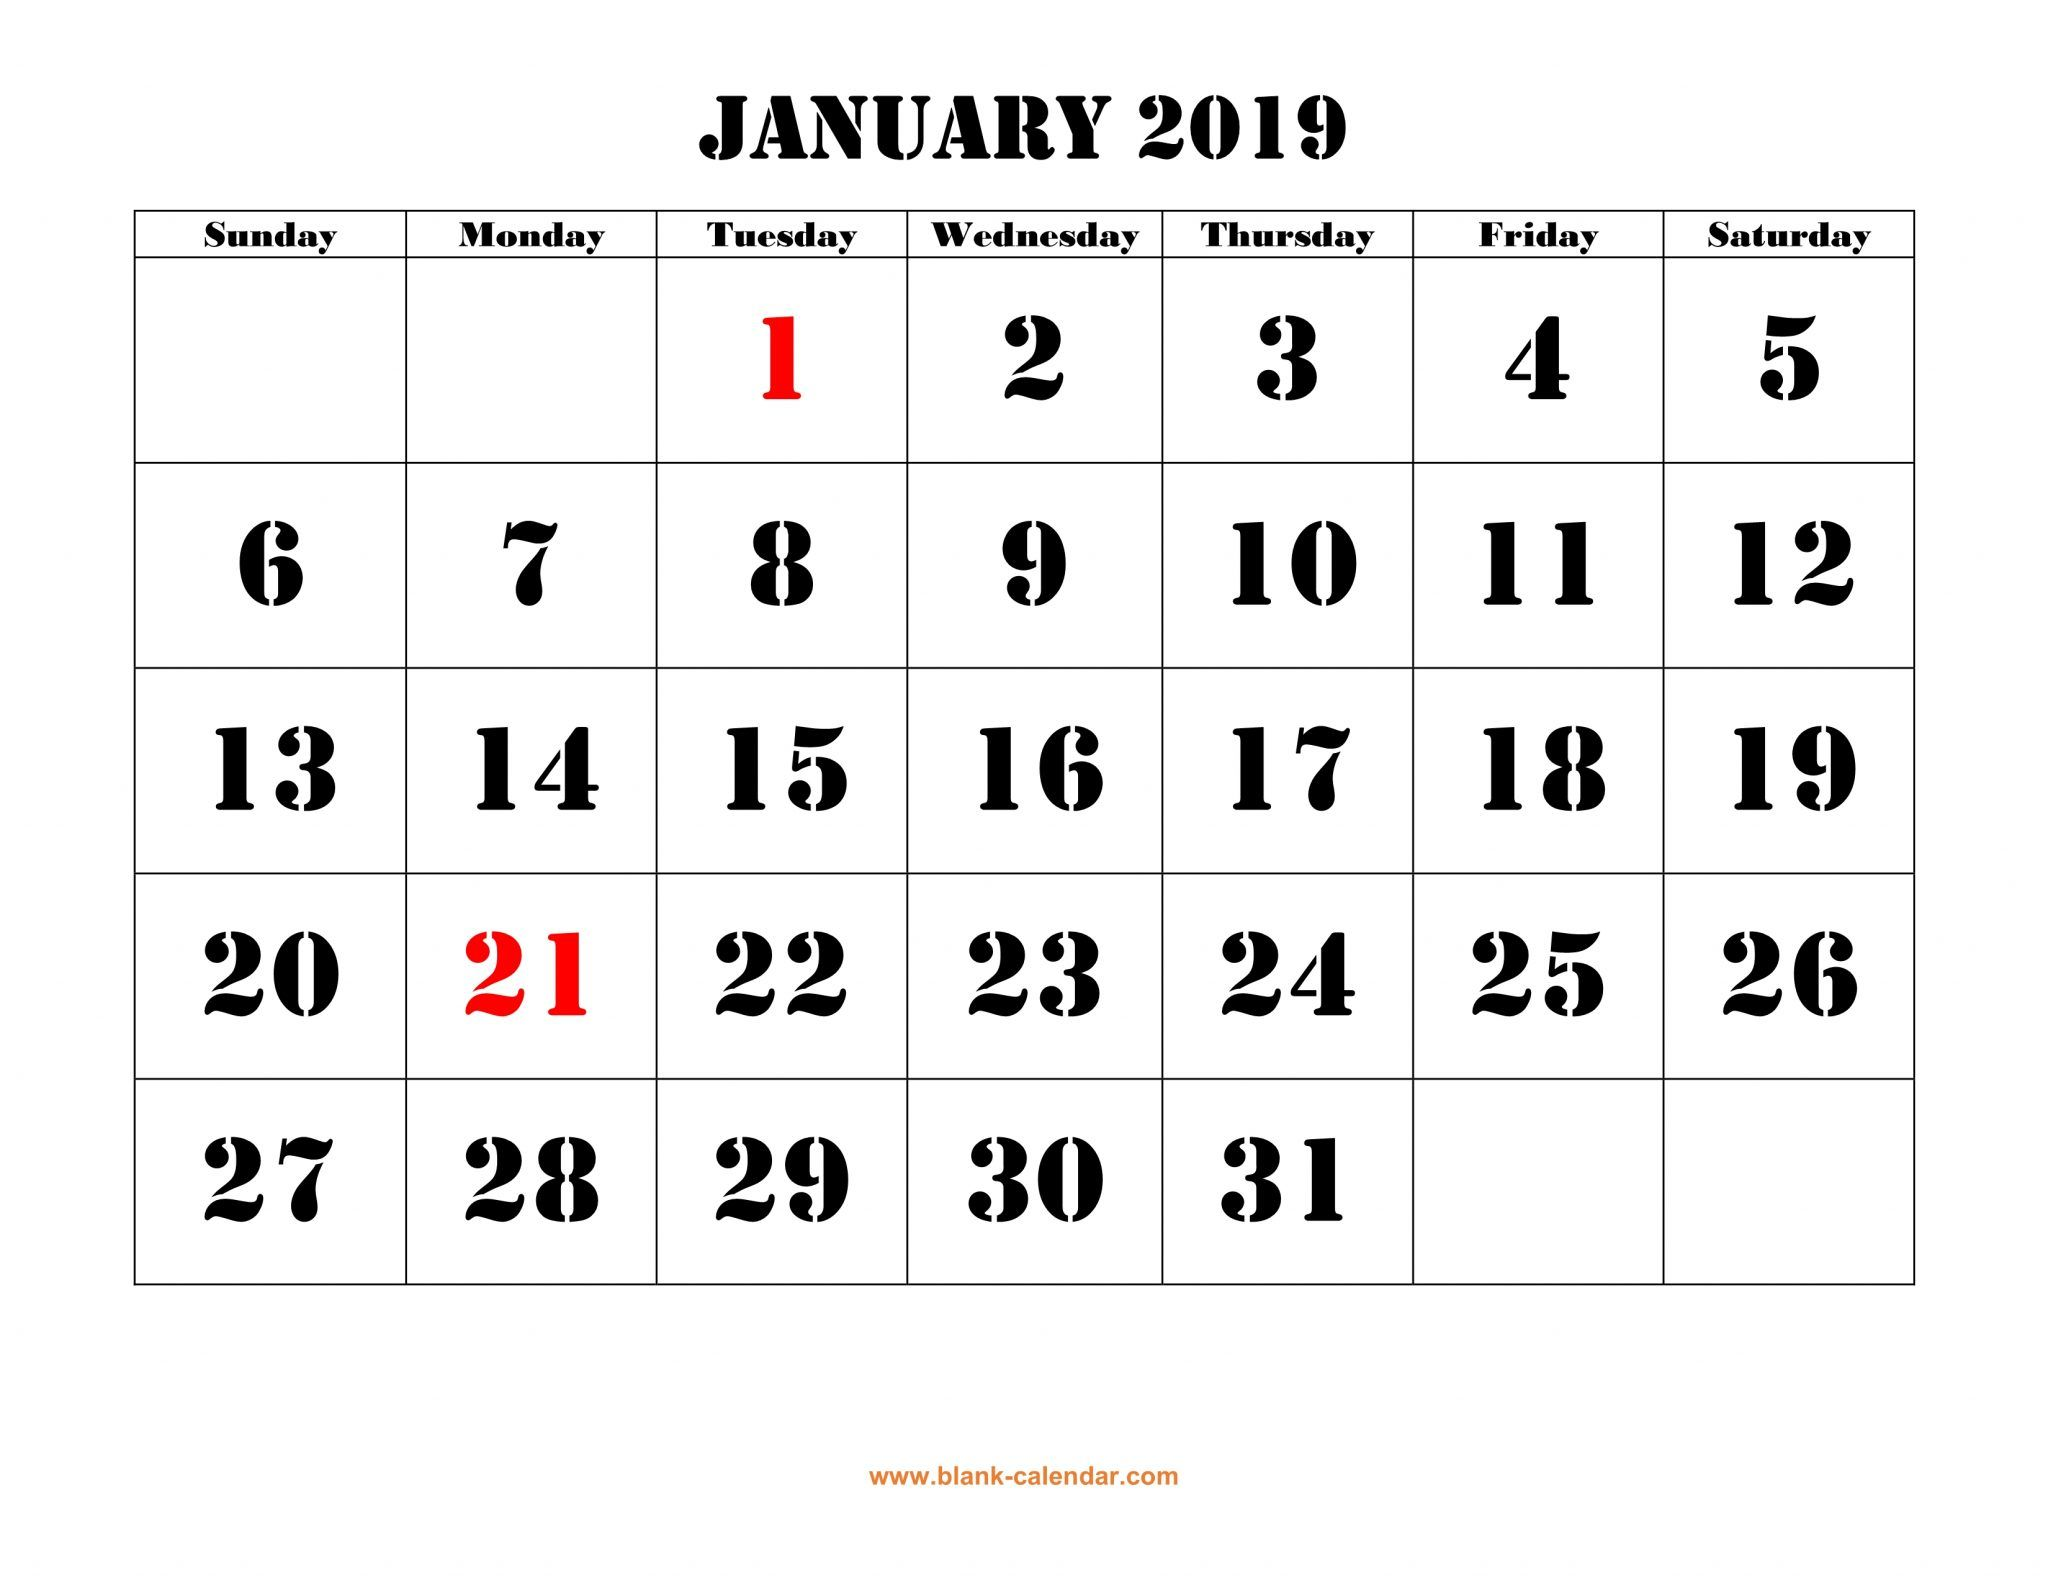 Calendar Dic 2017 January 2019 January 2019 Calendar Philippines | January 2019 Calendar